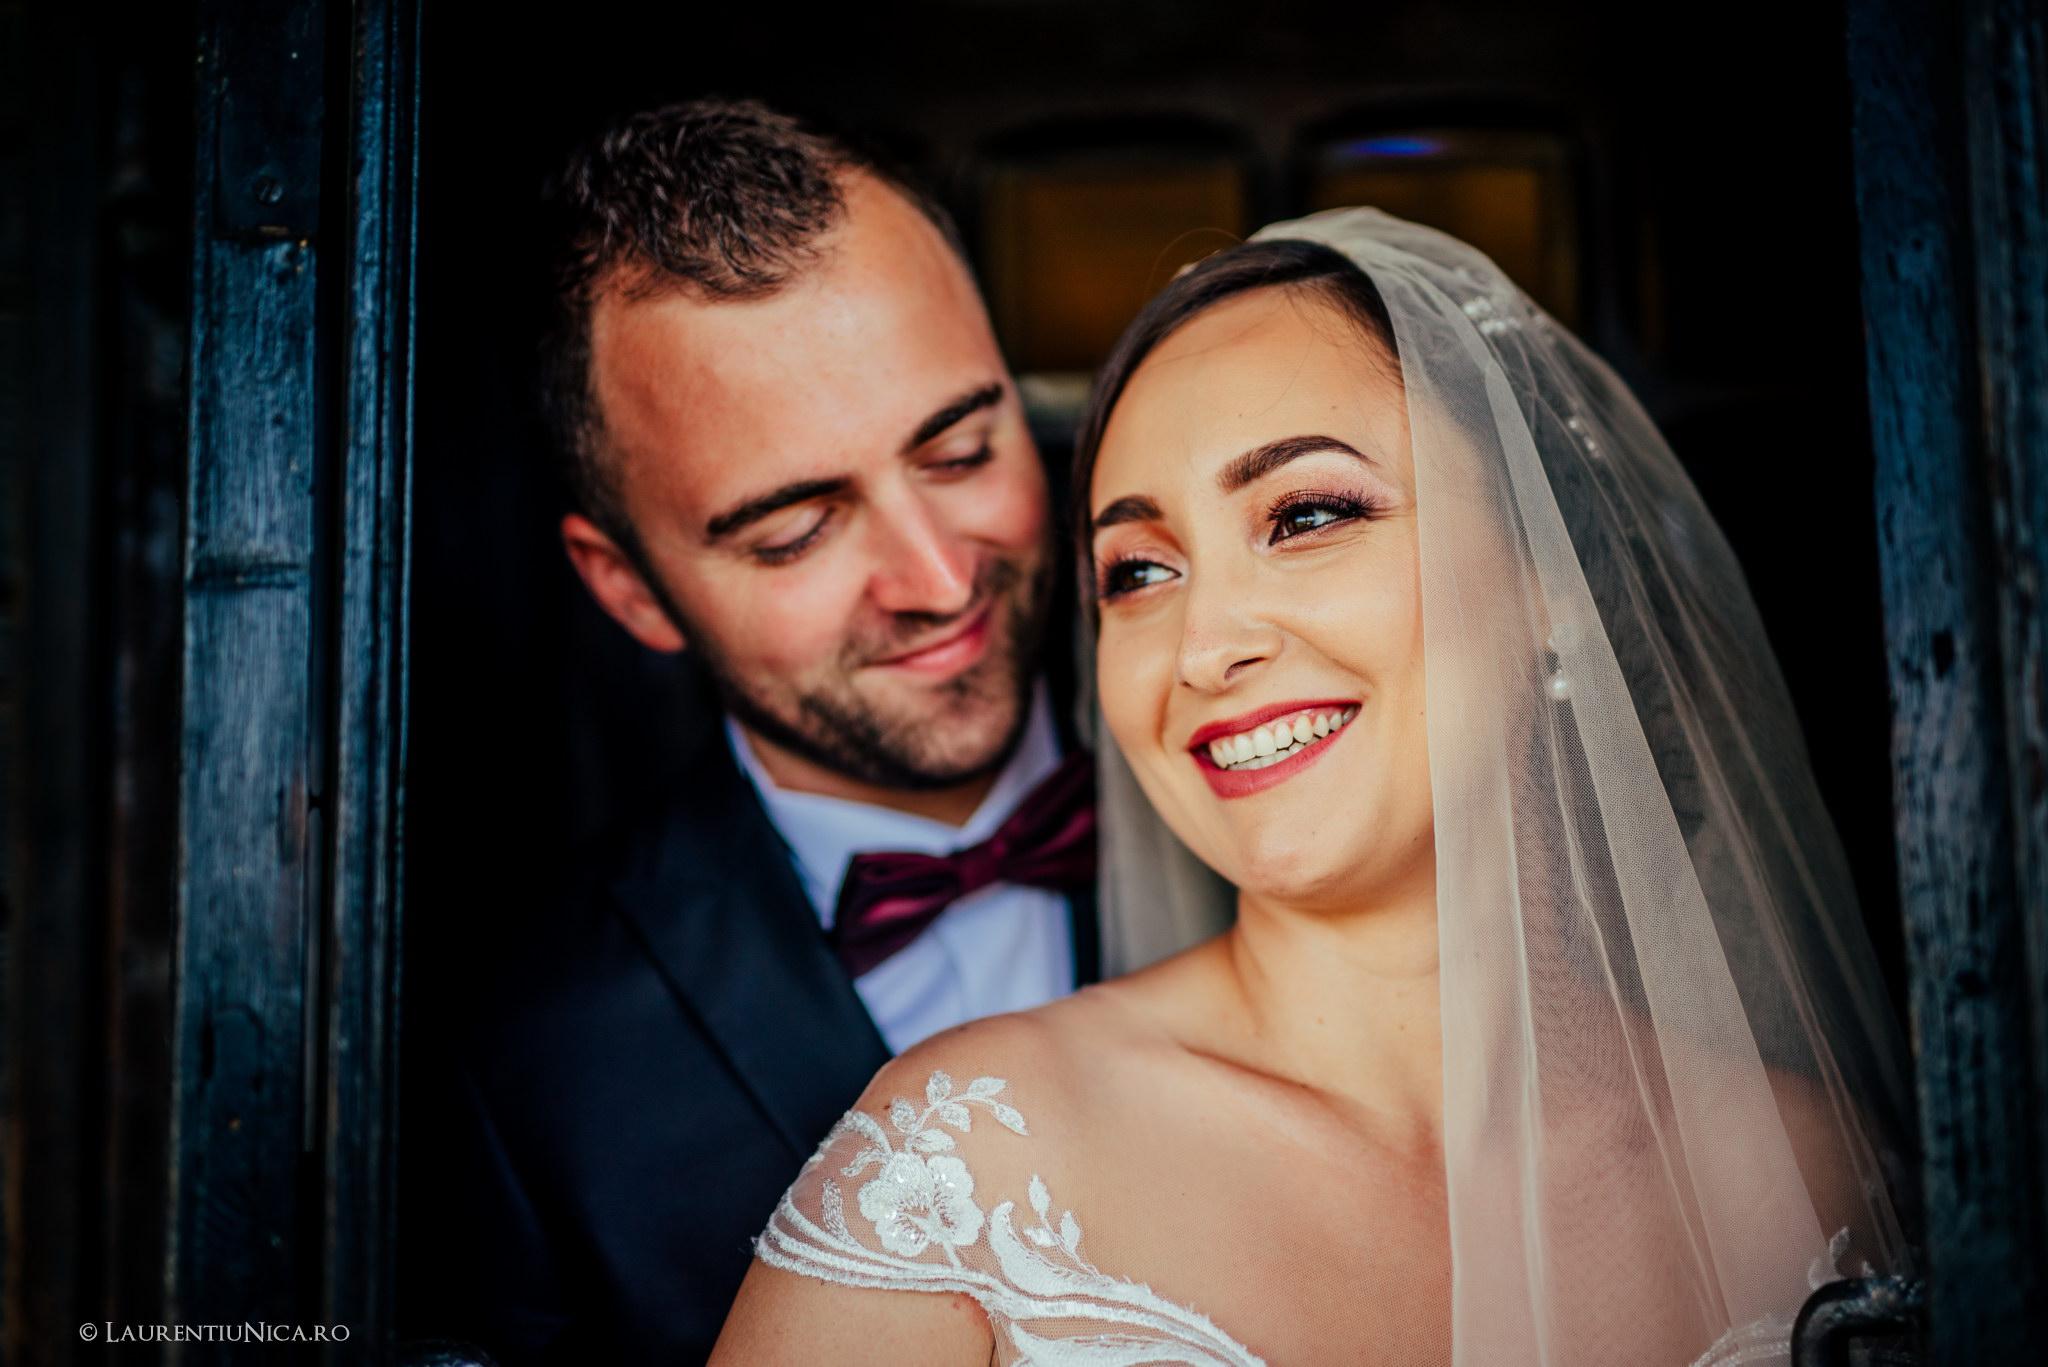 daiana si madalin fotograf nunta laurentiu nica targu jiu gorj 12 - Daiana & Madalin | Fotografii nunta | Targu-Jiu | Gorj